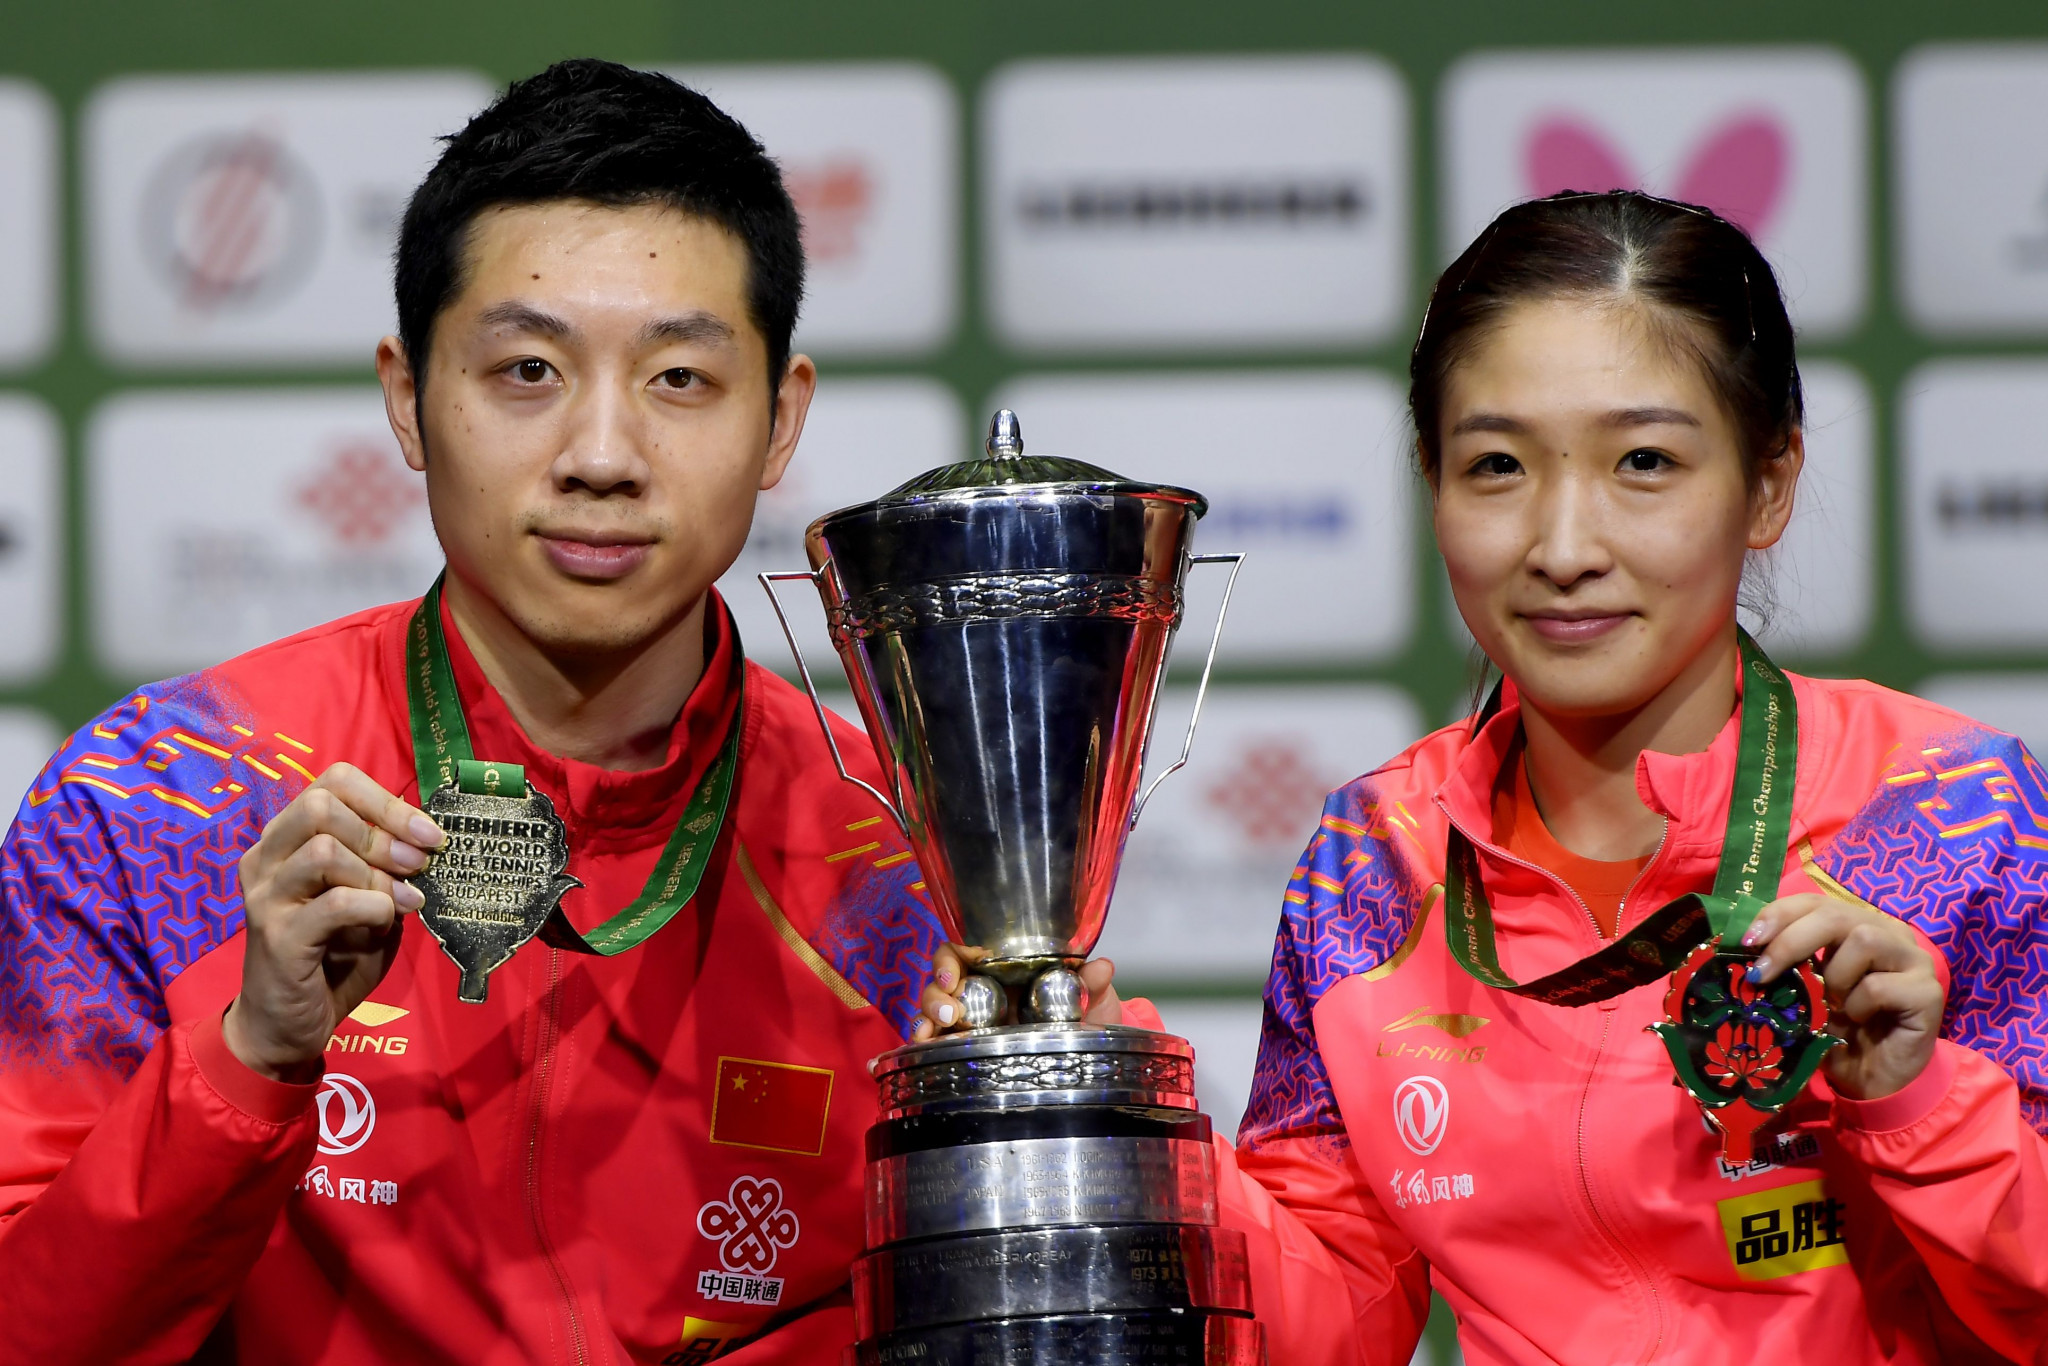 Xu and Liu crowned mixed doubles champions at ITTF World Championships